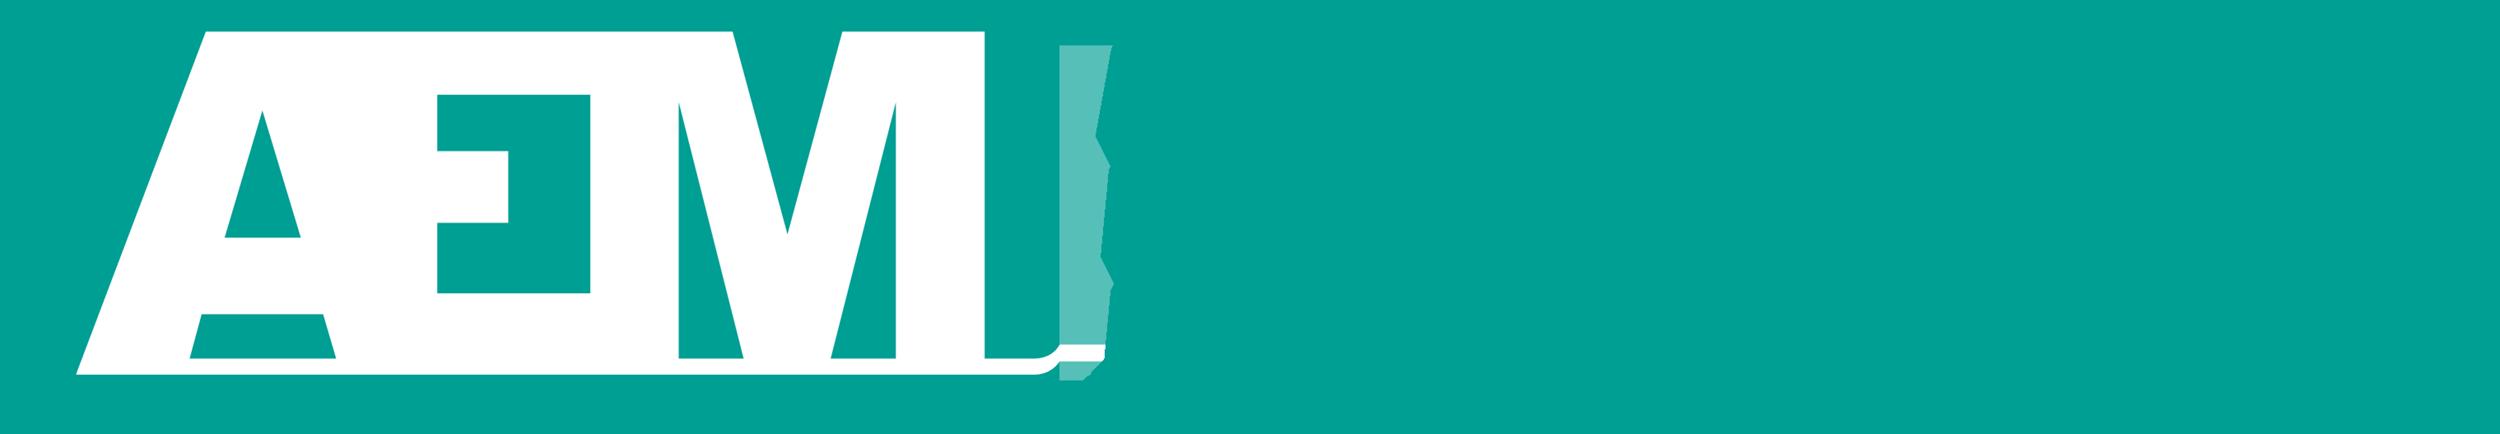 Vector CS4 ai (Illustrator). AEM Logo Teal - Aem Logo PNG